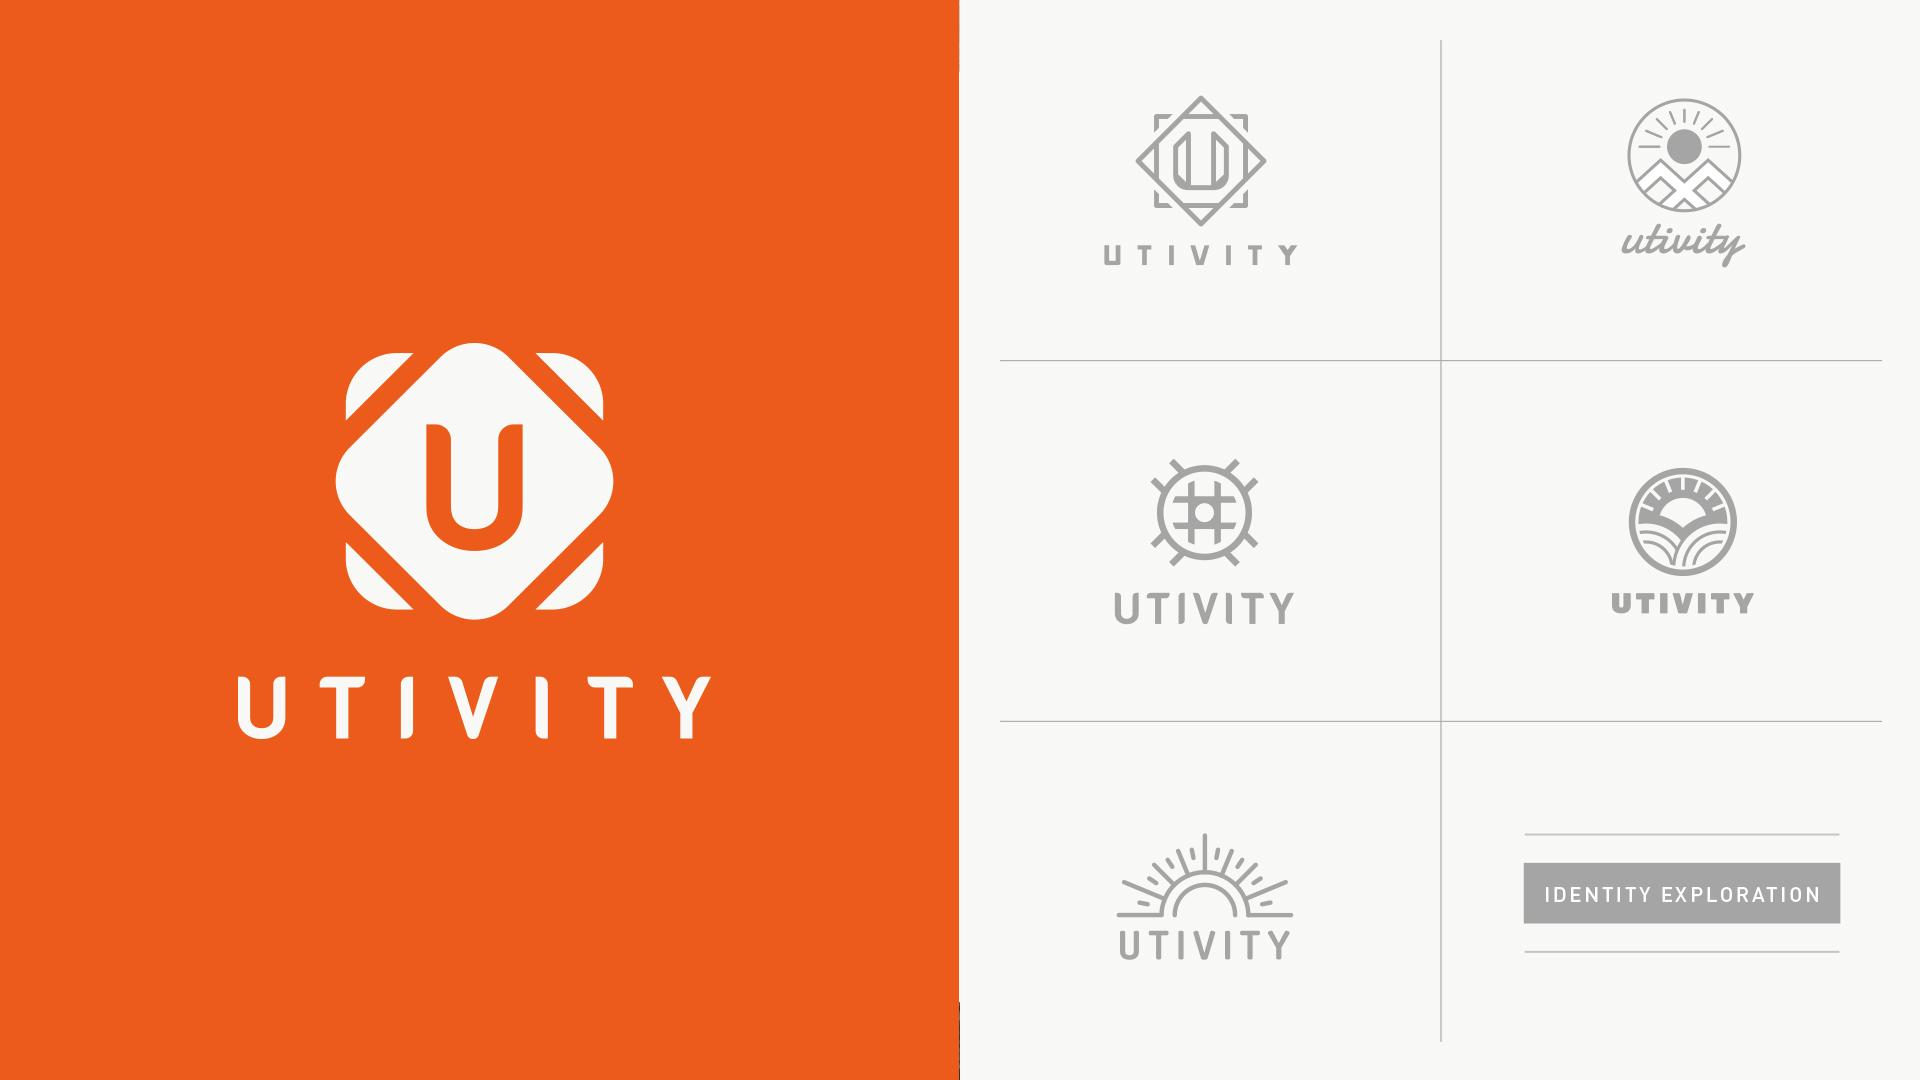 UtivityGallery1.jpg